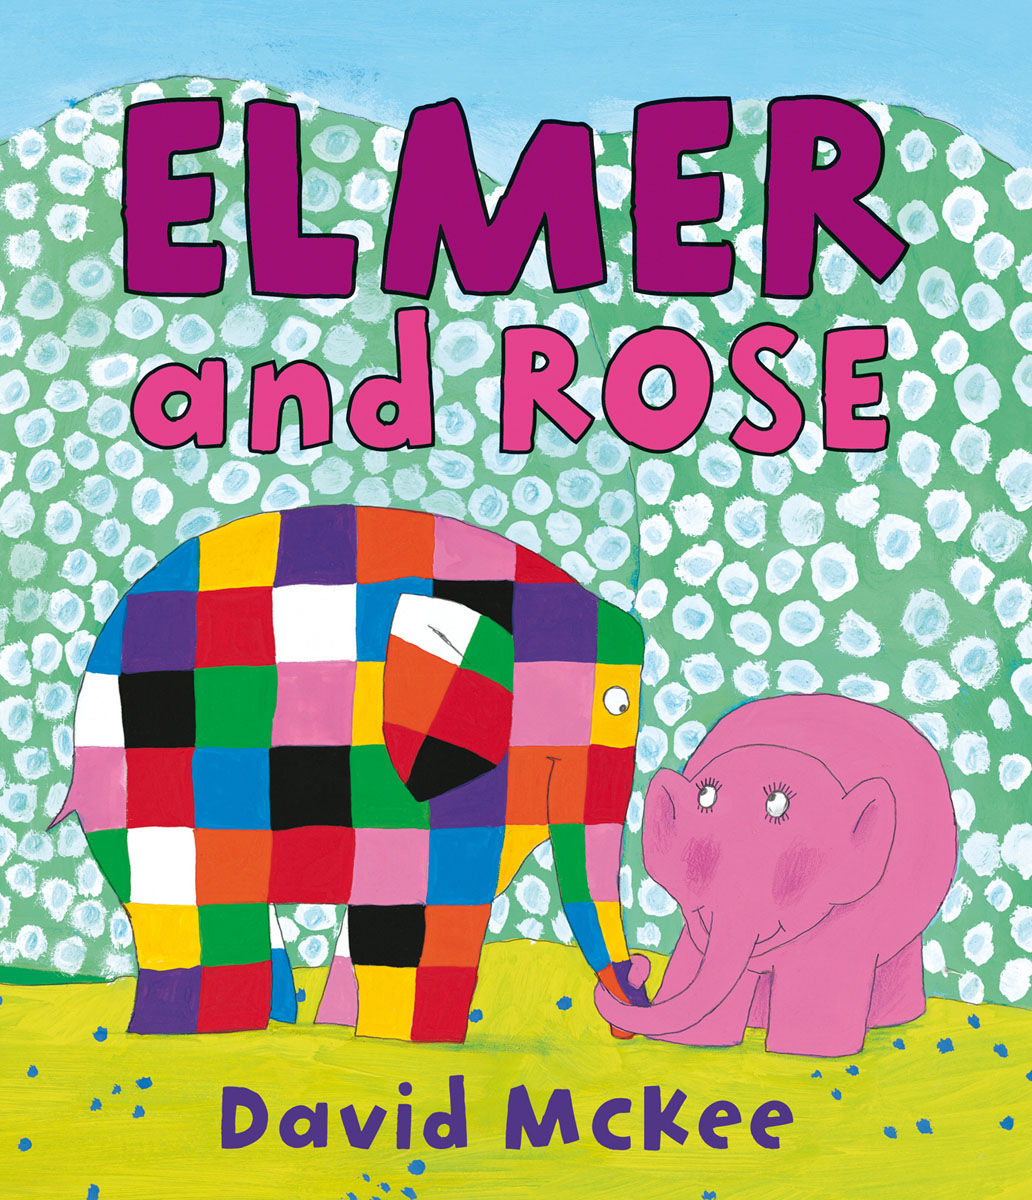 Elmer and Rose wilbur smith elephant song